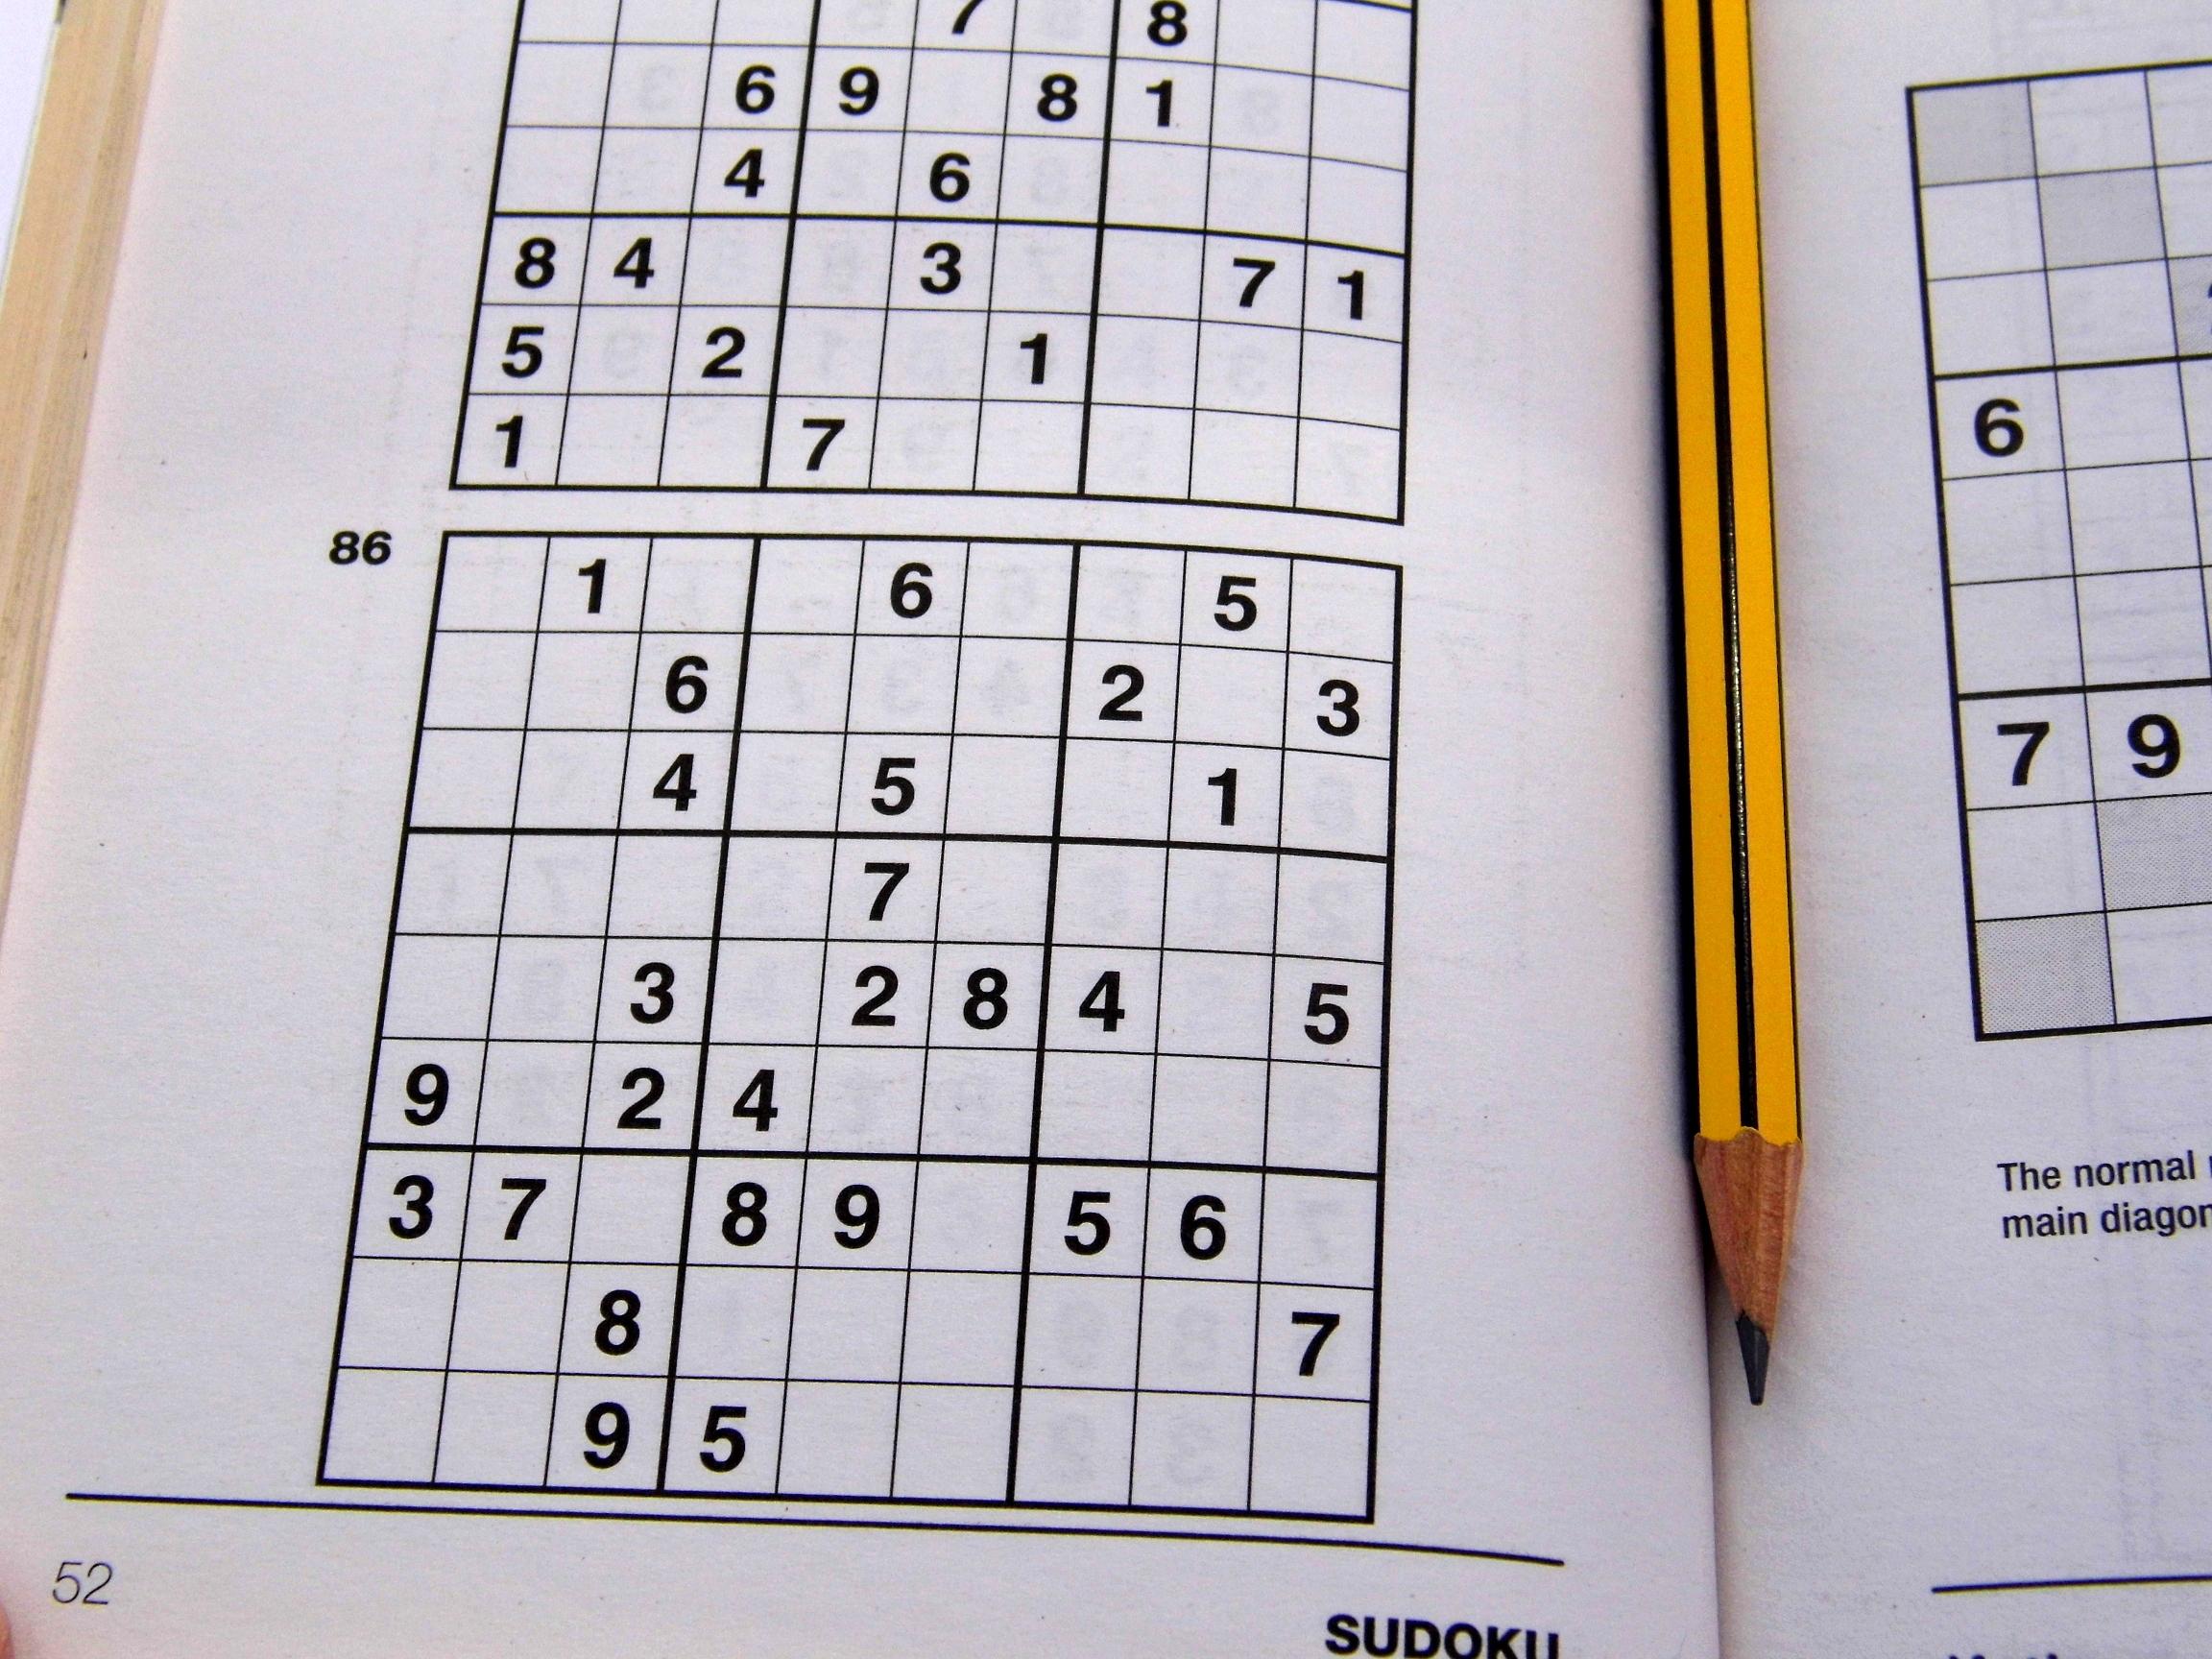 Medium Printable Sudoku Puzzles 6 Per Page – Book 1 – Free Sudoku - Printable Sudoku Puzzles 6 Per Page